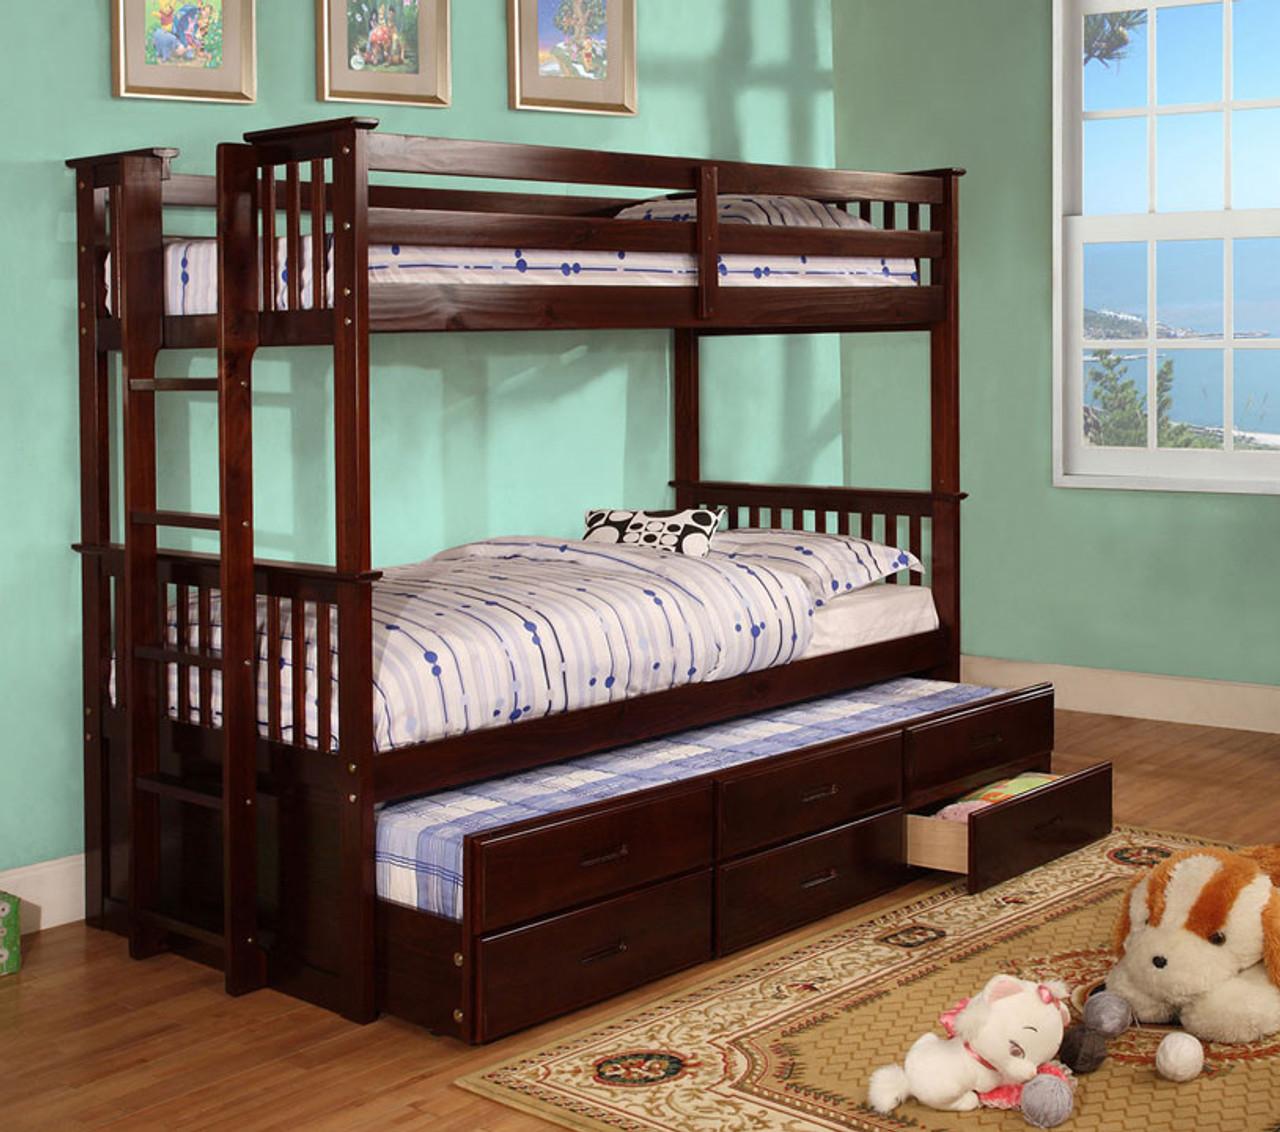 Classic Trundle Bunk Bed | Furniture of America